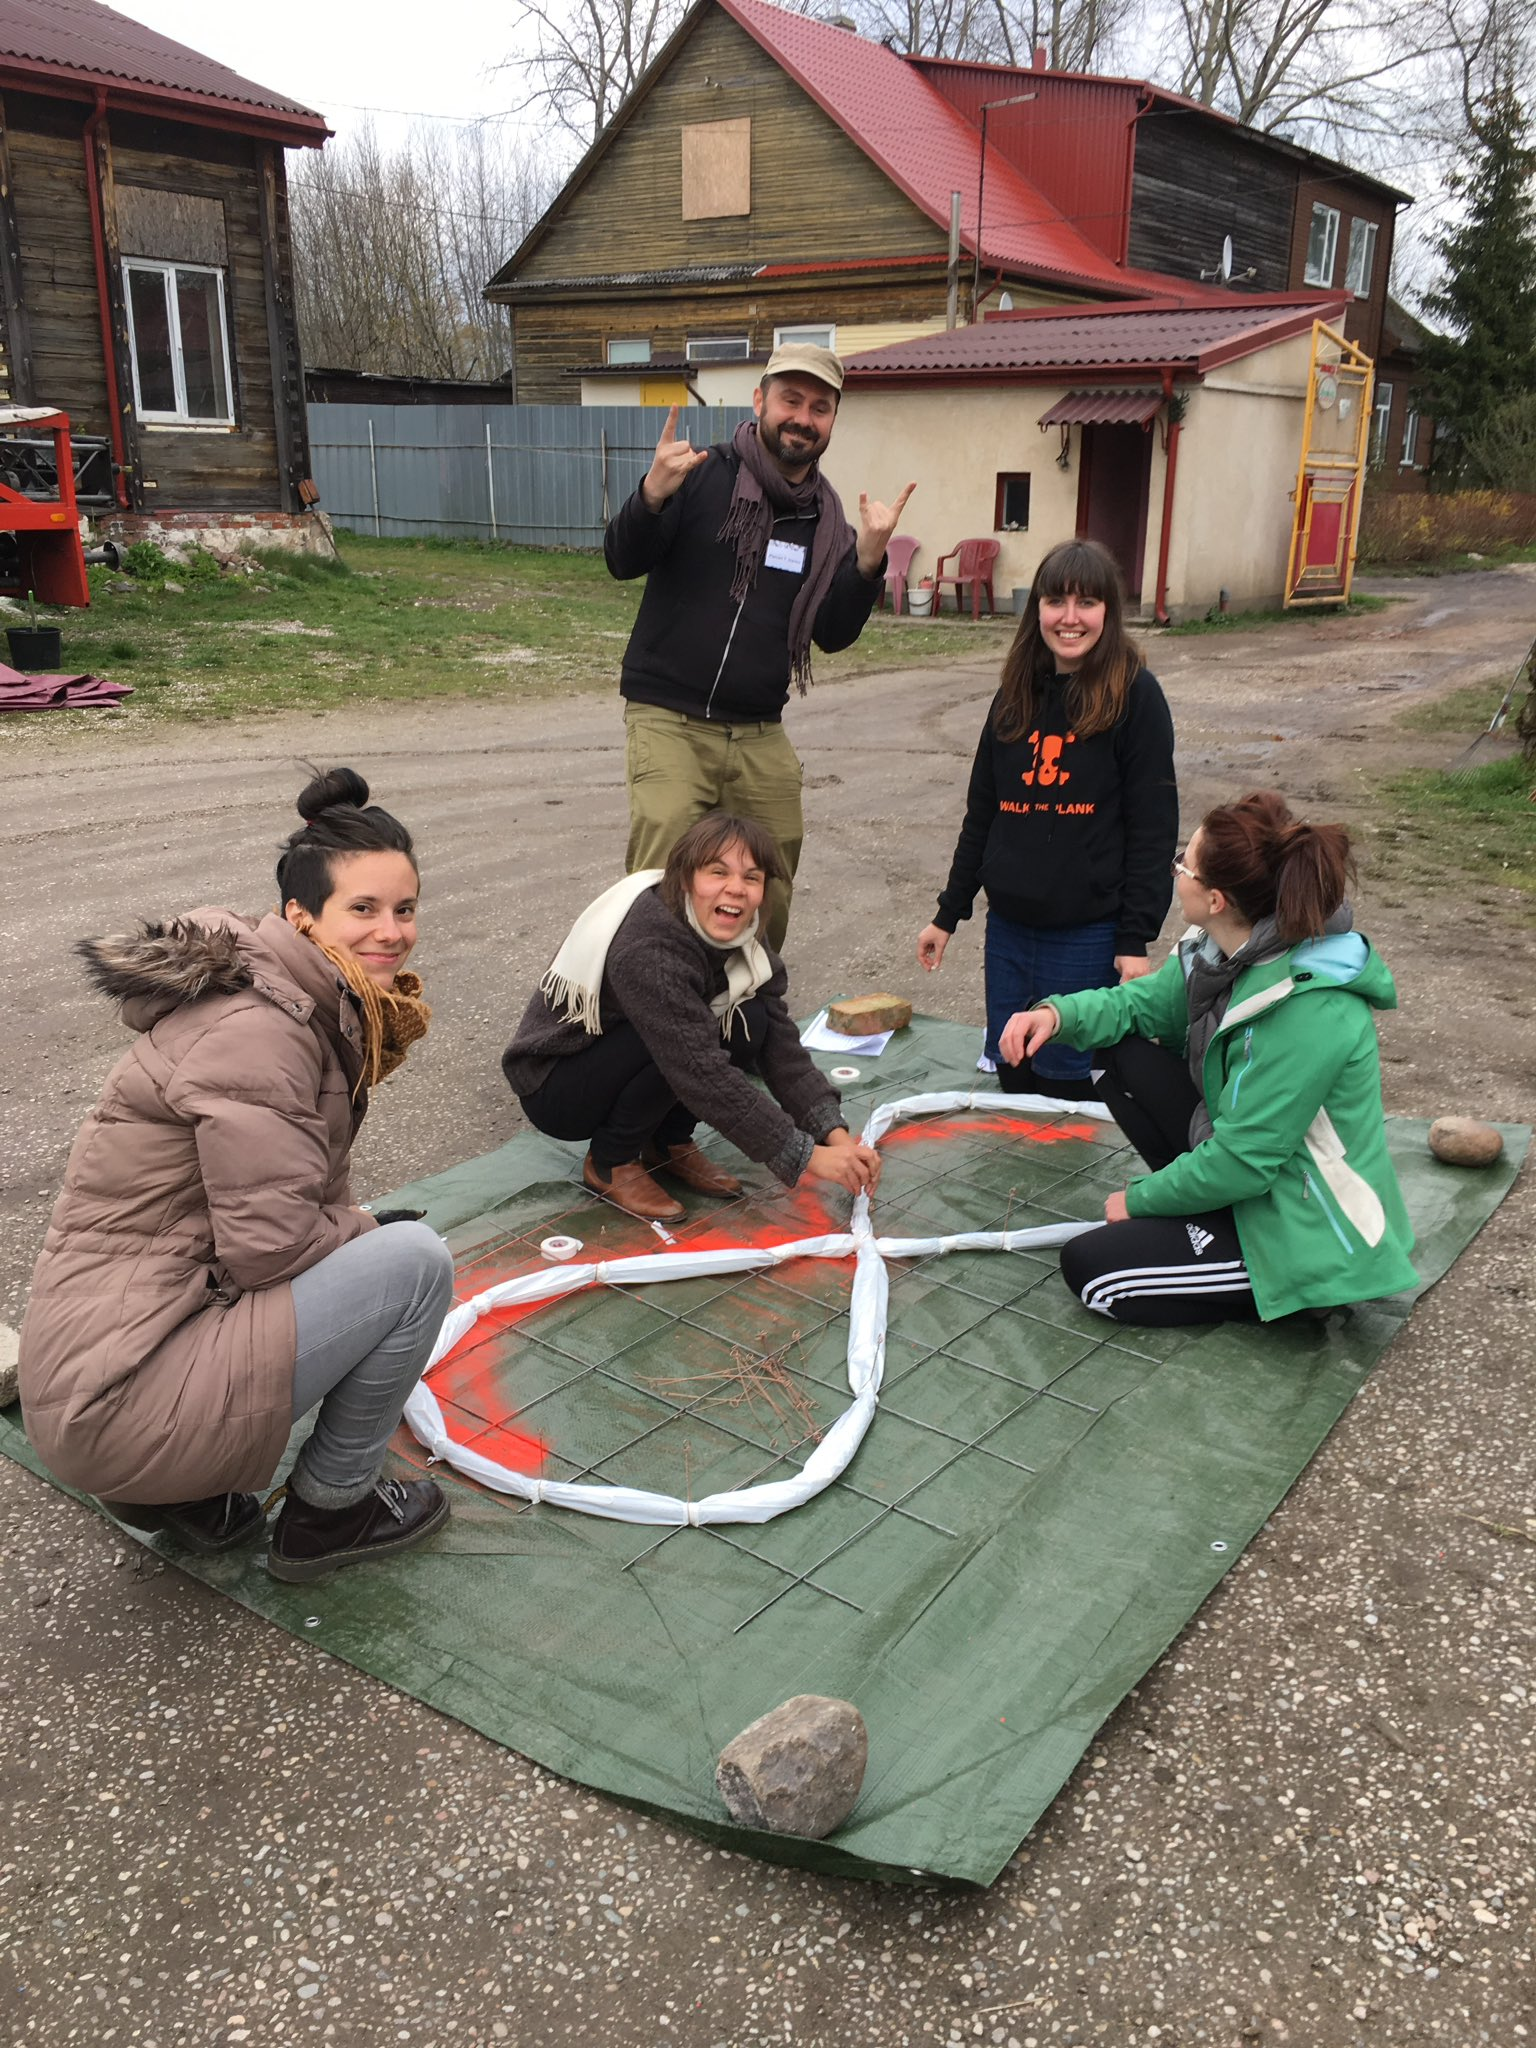 Fire drawing with Plamen (Bulgaria), Ria (Ireland), Ruta (LT/UK) and Carolina (Argentina) #SchoolofSpectacle @europe_creative https://t.co/4nfr5JiT4e